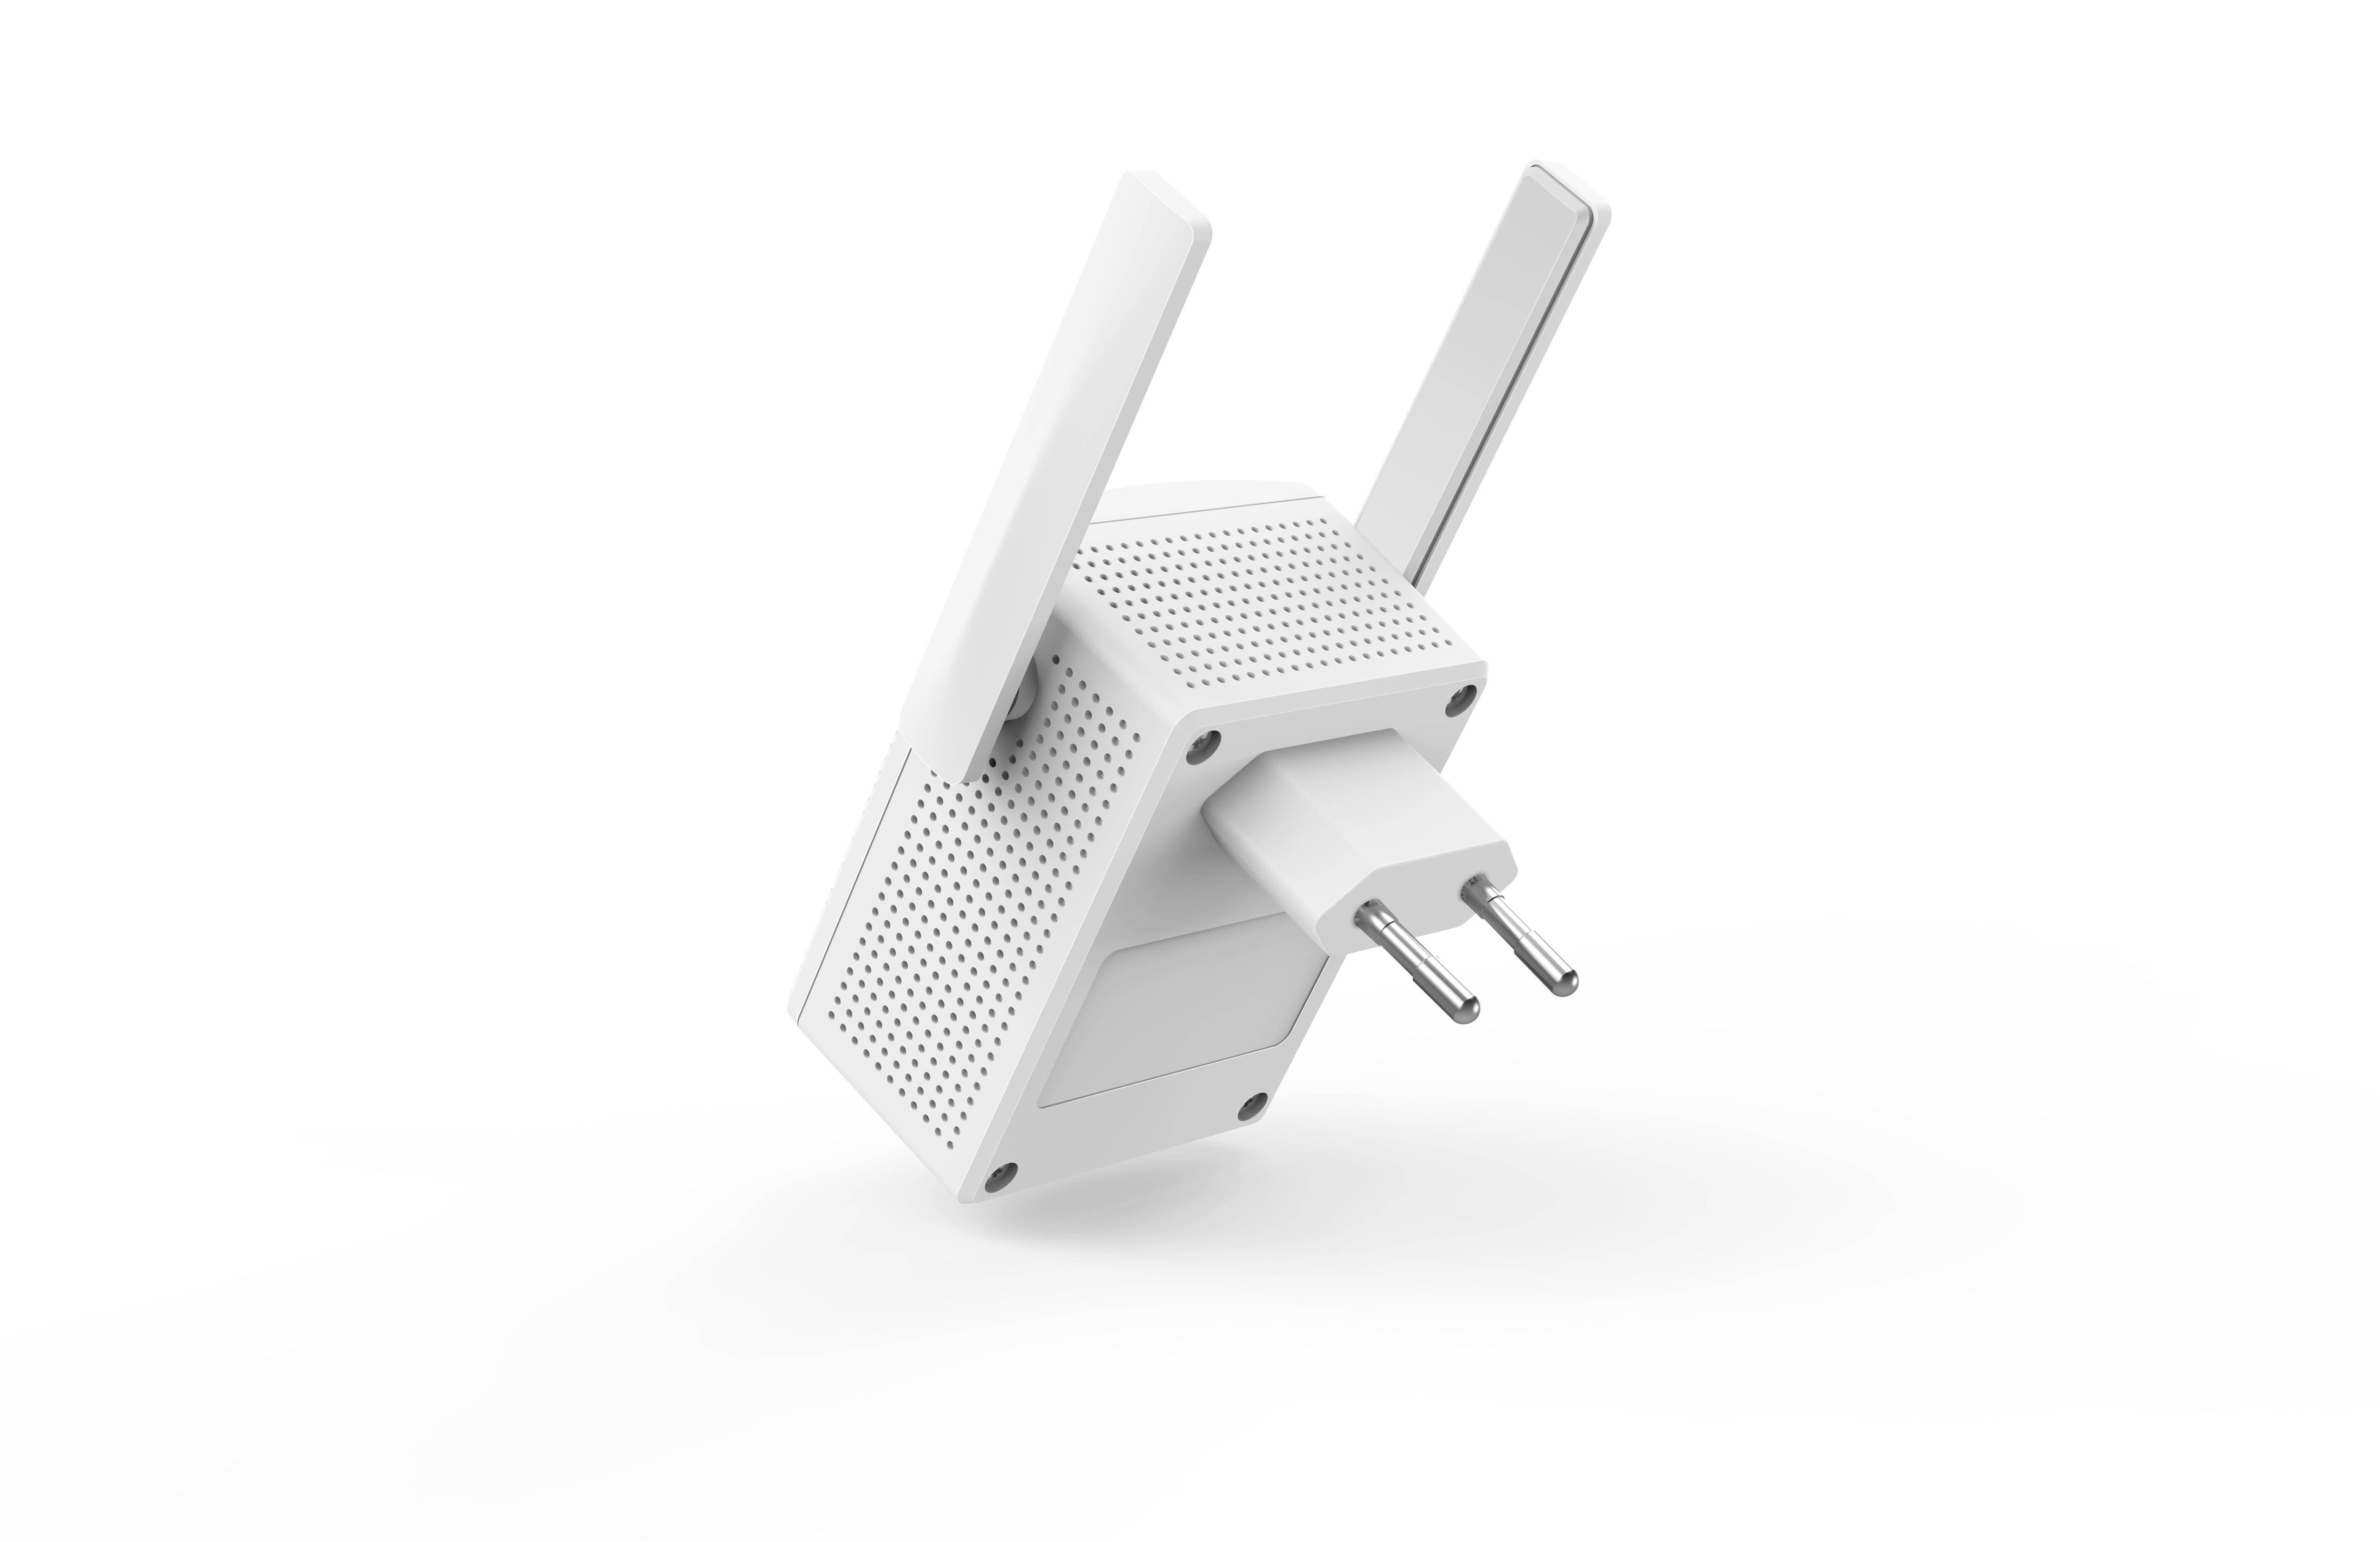 Tenda A18  867 Mbit/s  11  54  300  867 Mbps  External  Omnidirectional  2 dBi  2.412  2.484  5.15  5.25 GHz